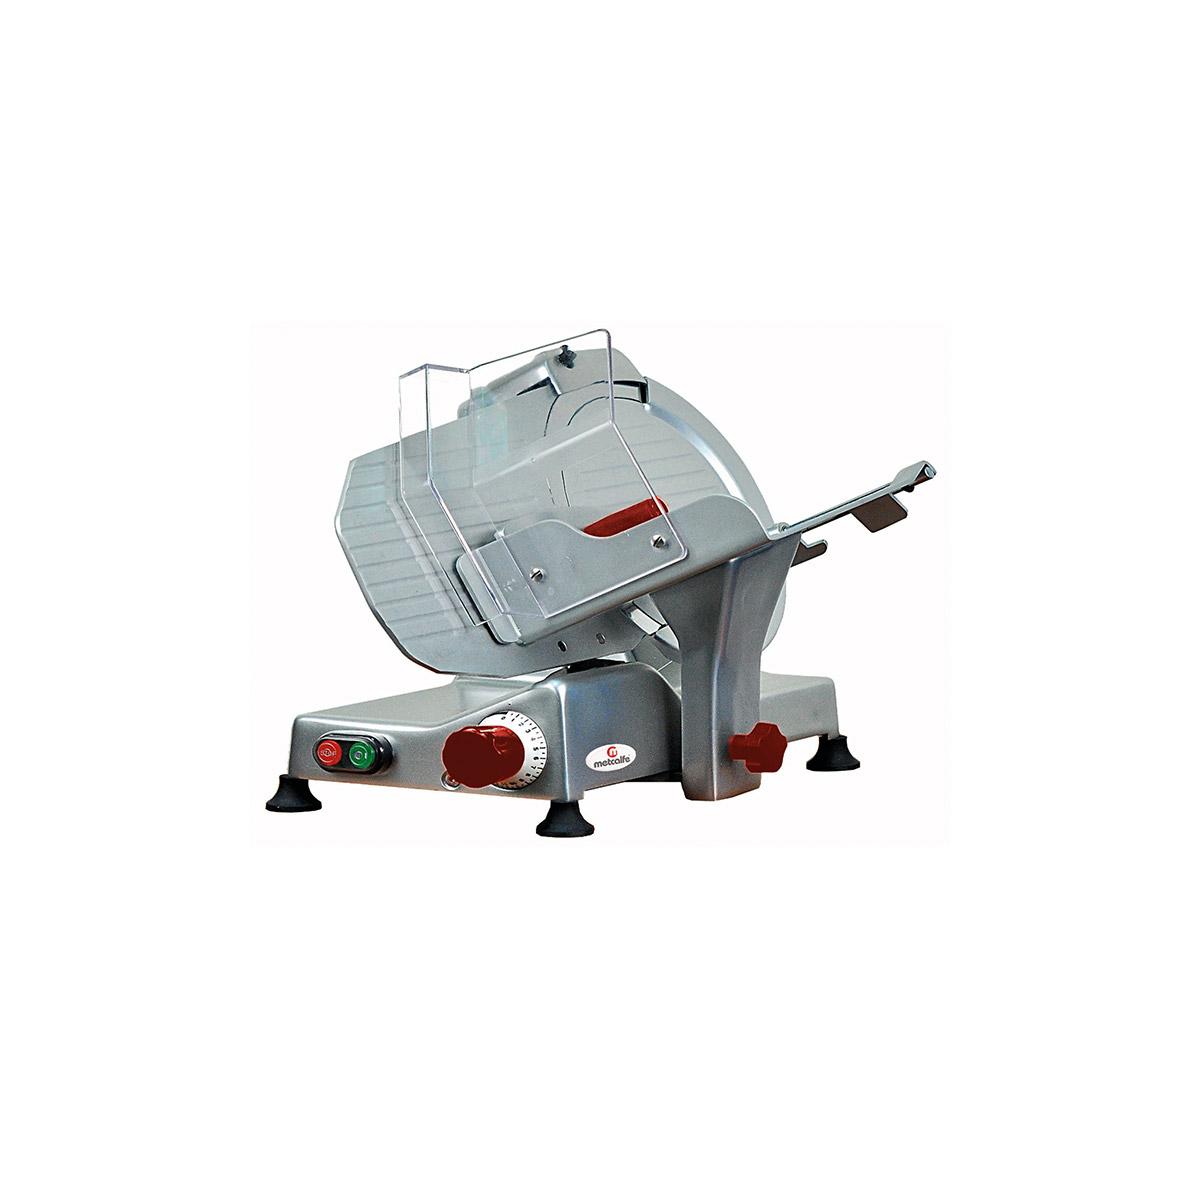 Metcalfe NSL220 Light Duty Gravity Feed Slicer